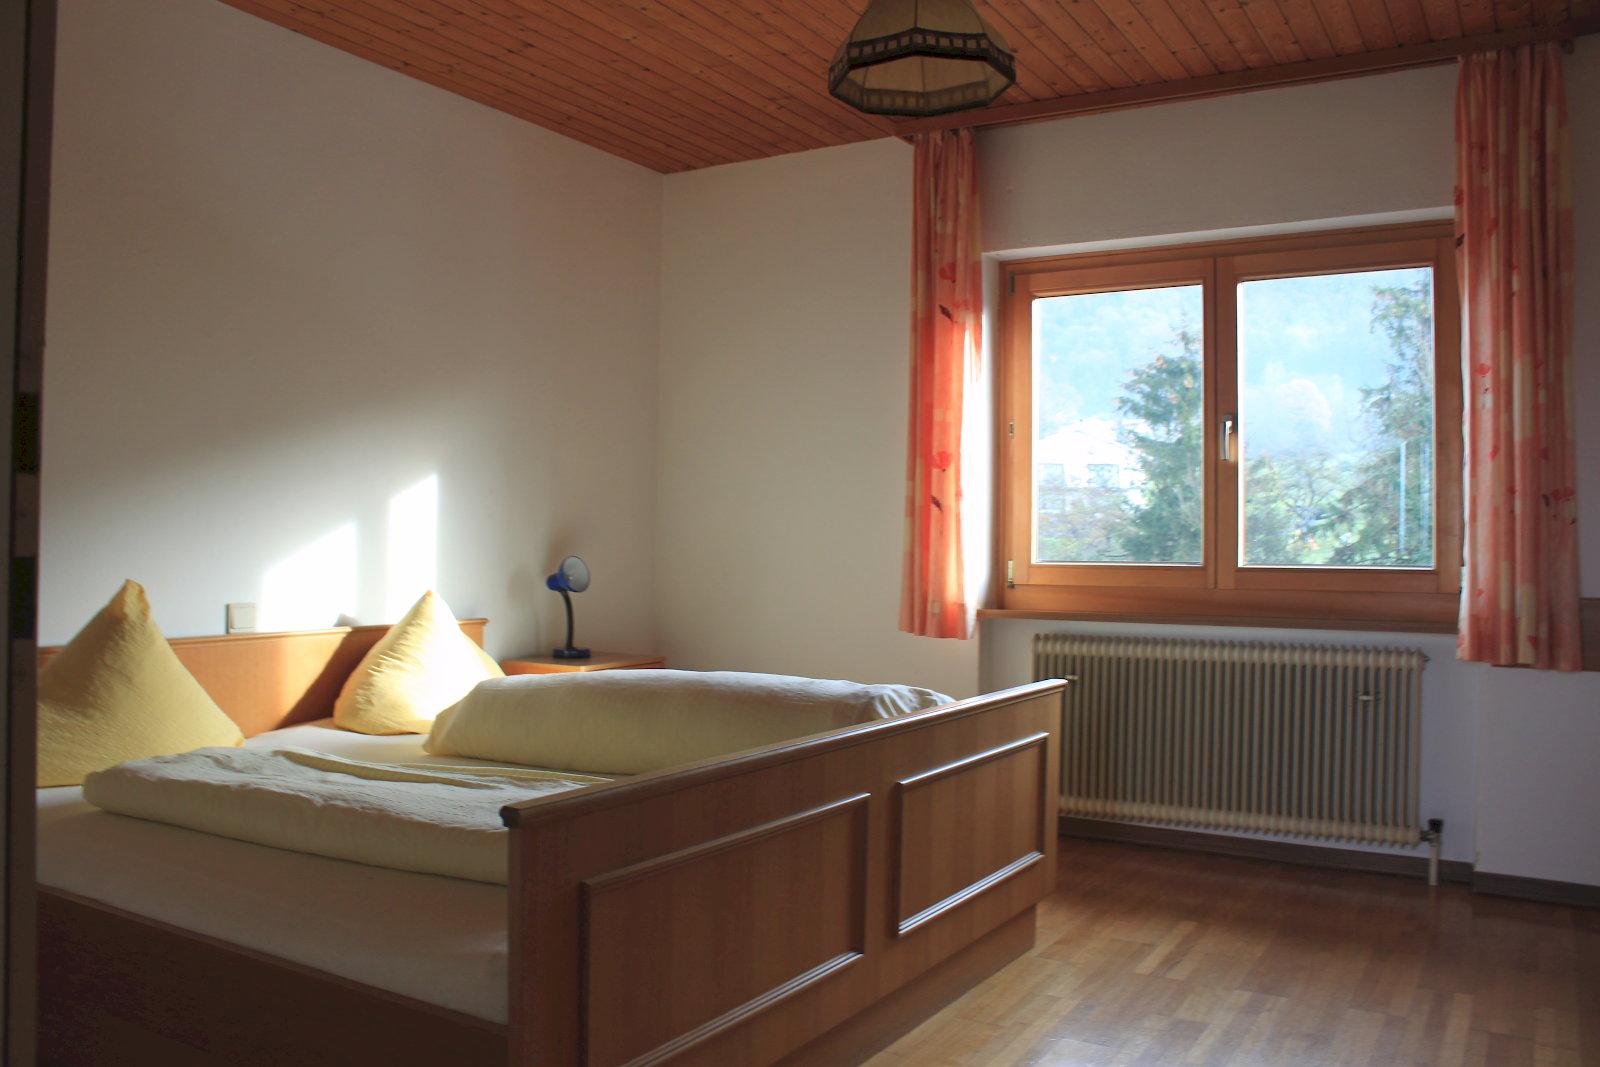 Appartement de vacances B&B - Restaurant TSINGDAO (Hörbranz). Doppelzimmer (2437460), Hörbranz, Bregenz, Vorarlberg, Autriche, image 8